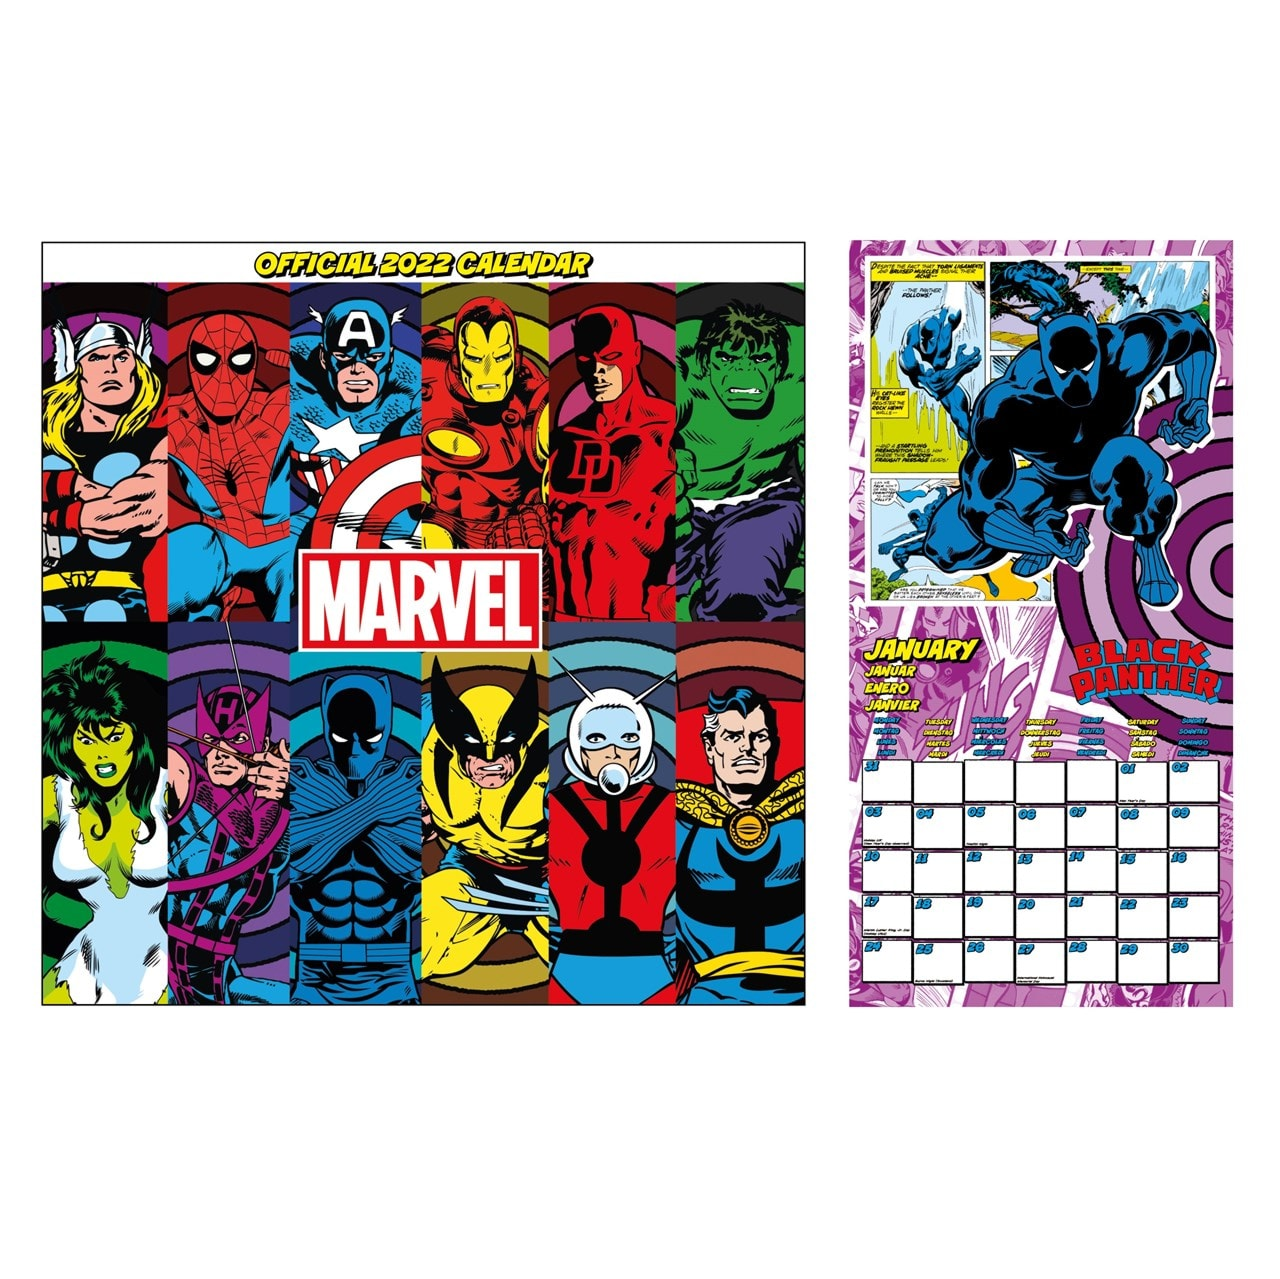 Marvel Retro Comic Book: Square 2022 Calendar - 1